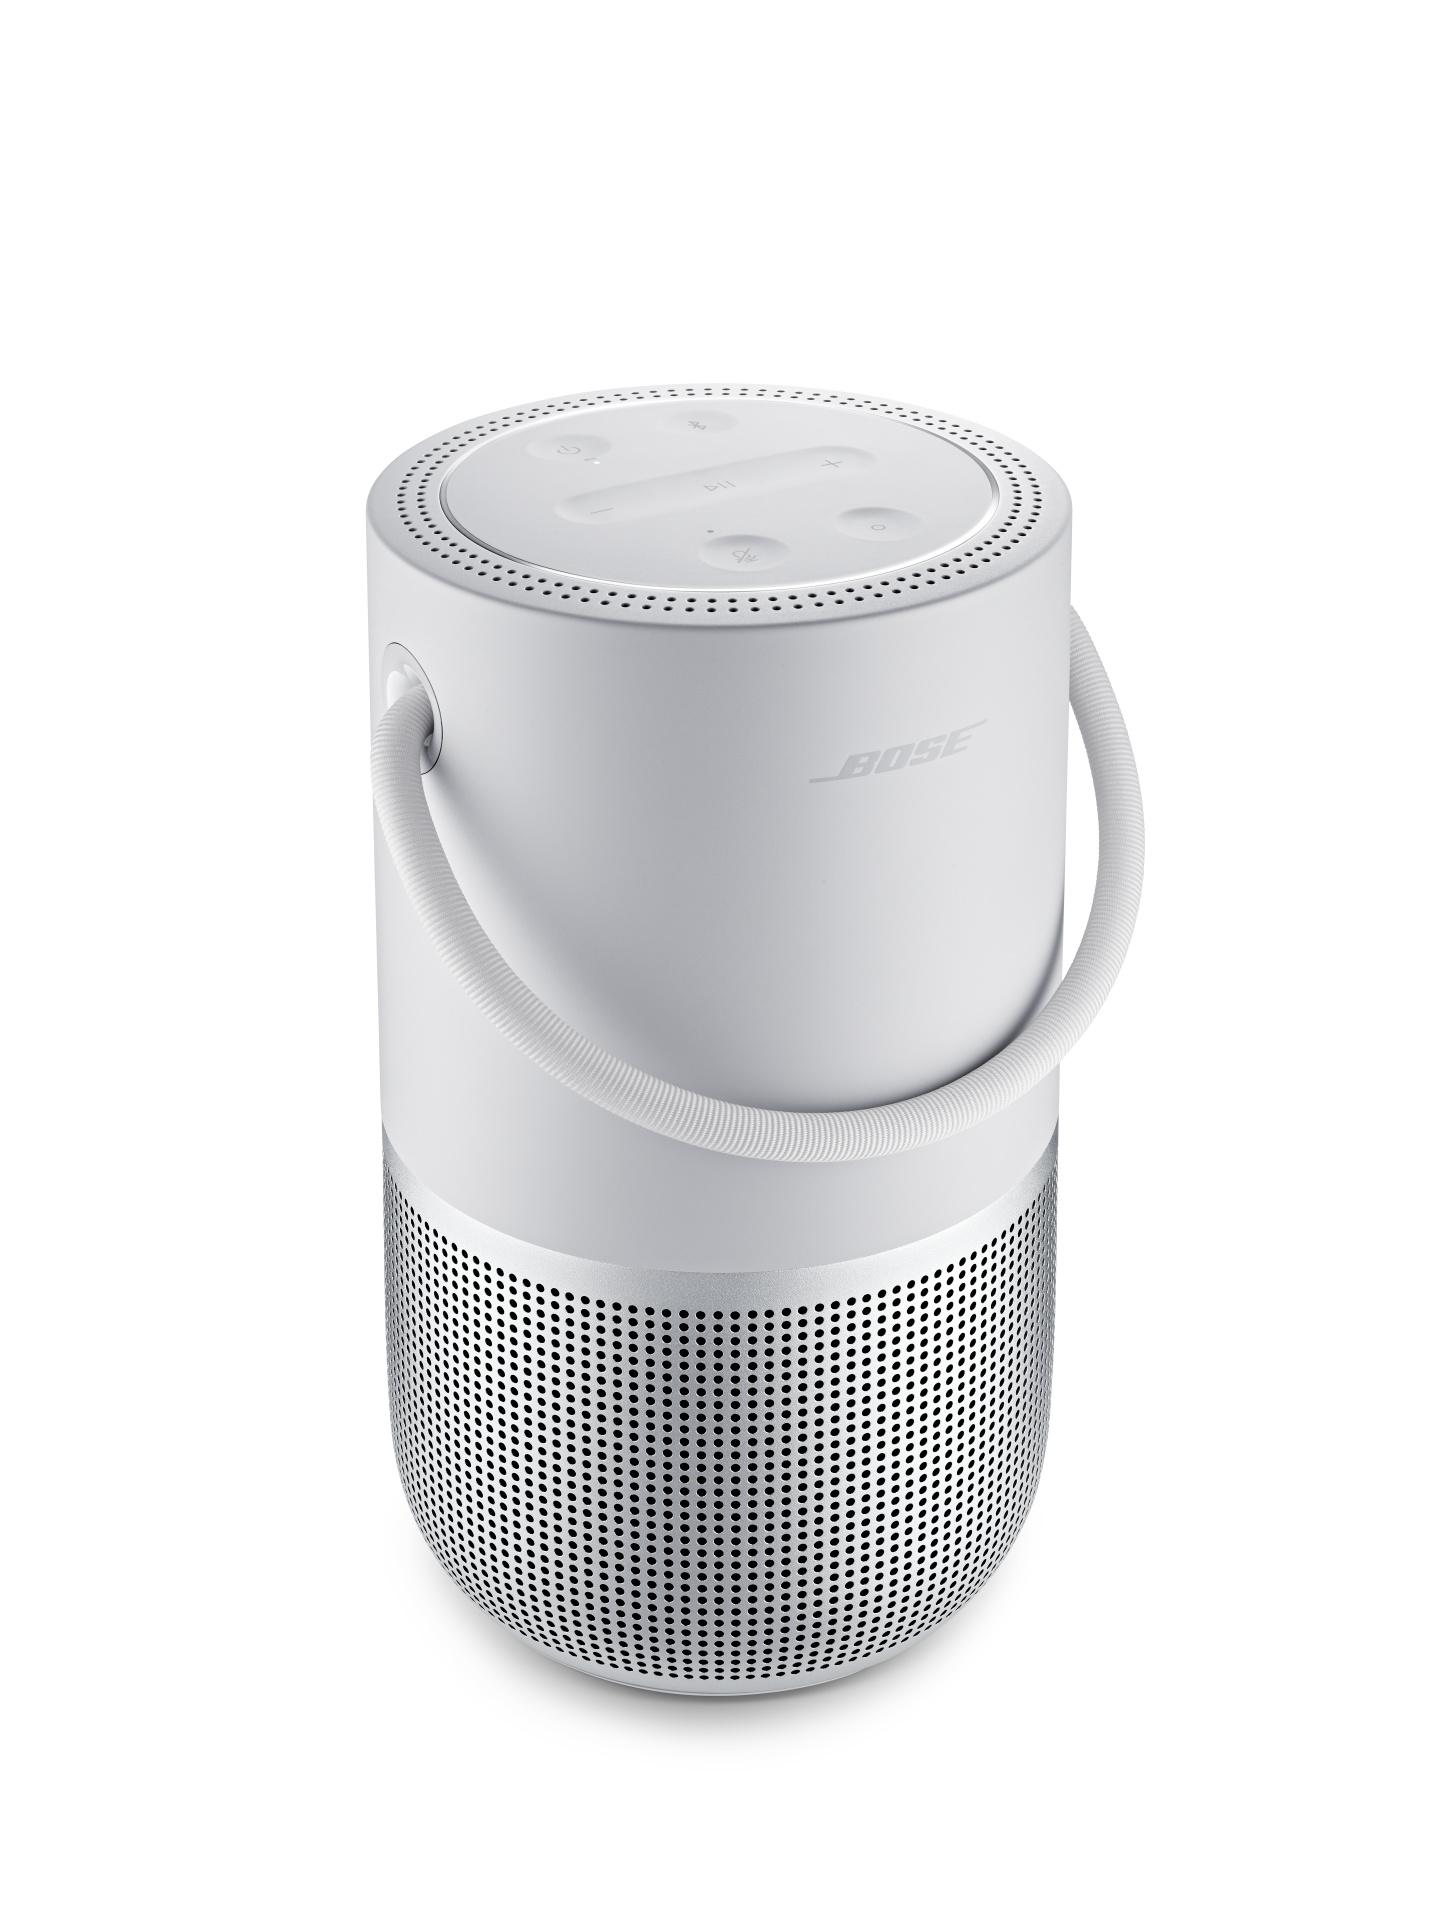 Bose Portable Home Speaker srebrny   Autoryzowany Dealer   Dostępny od ręki!